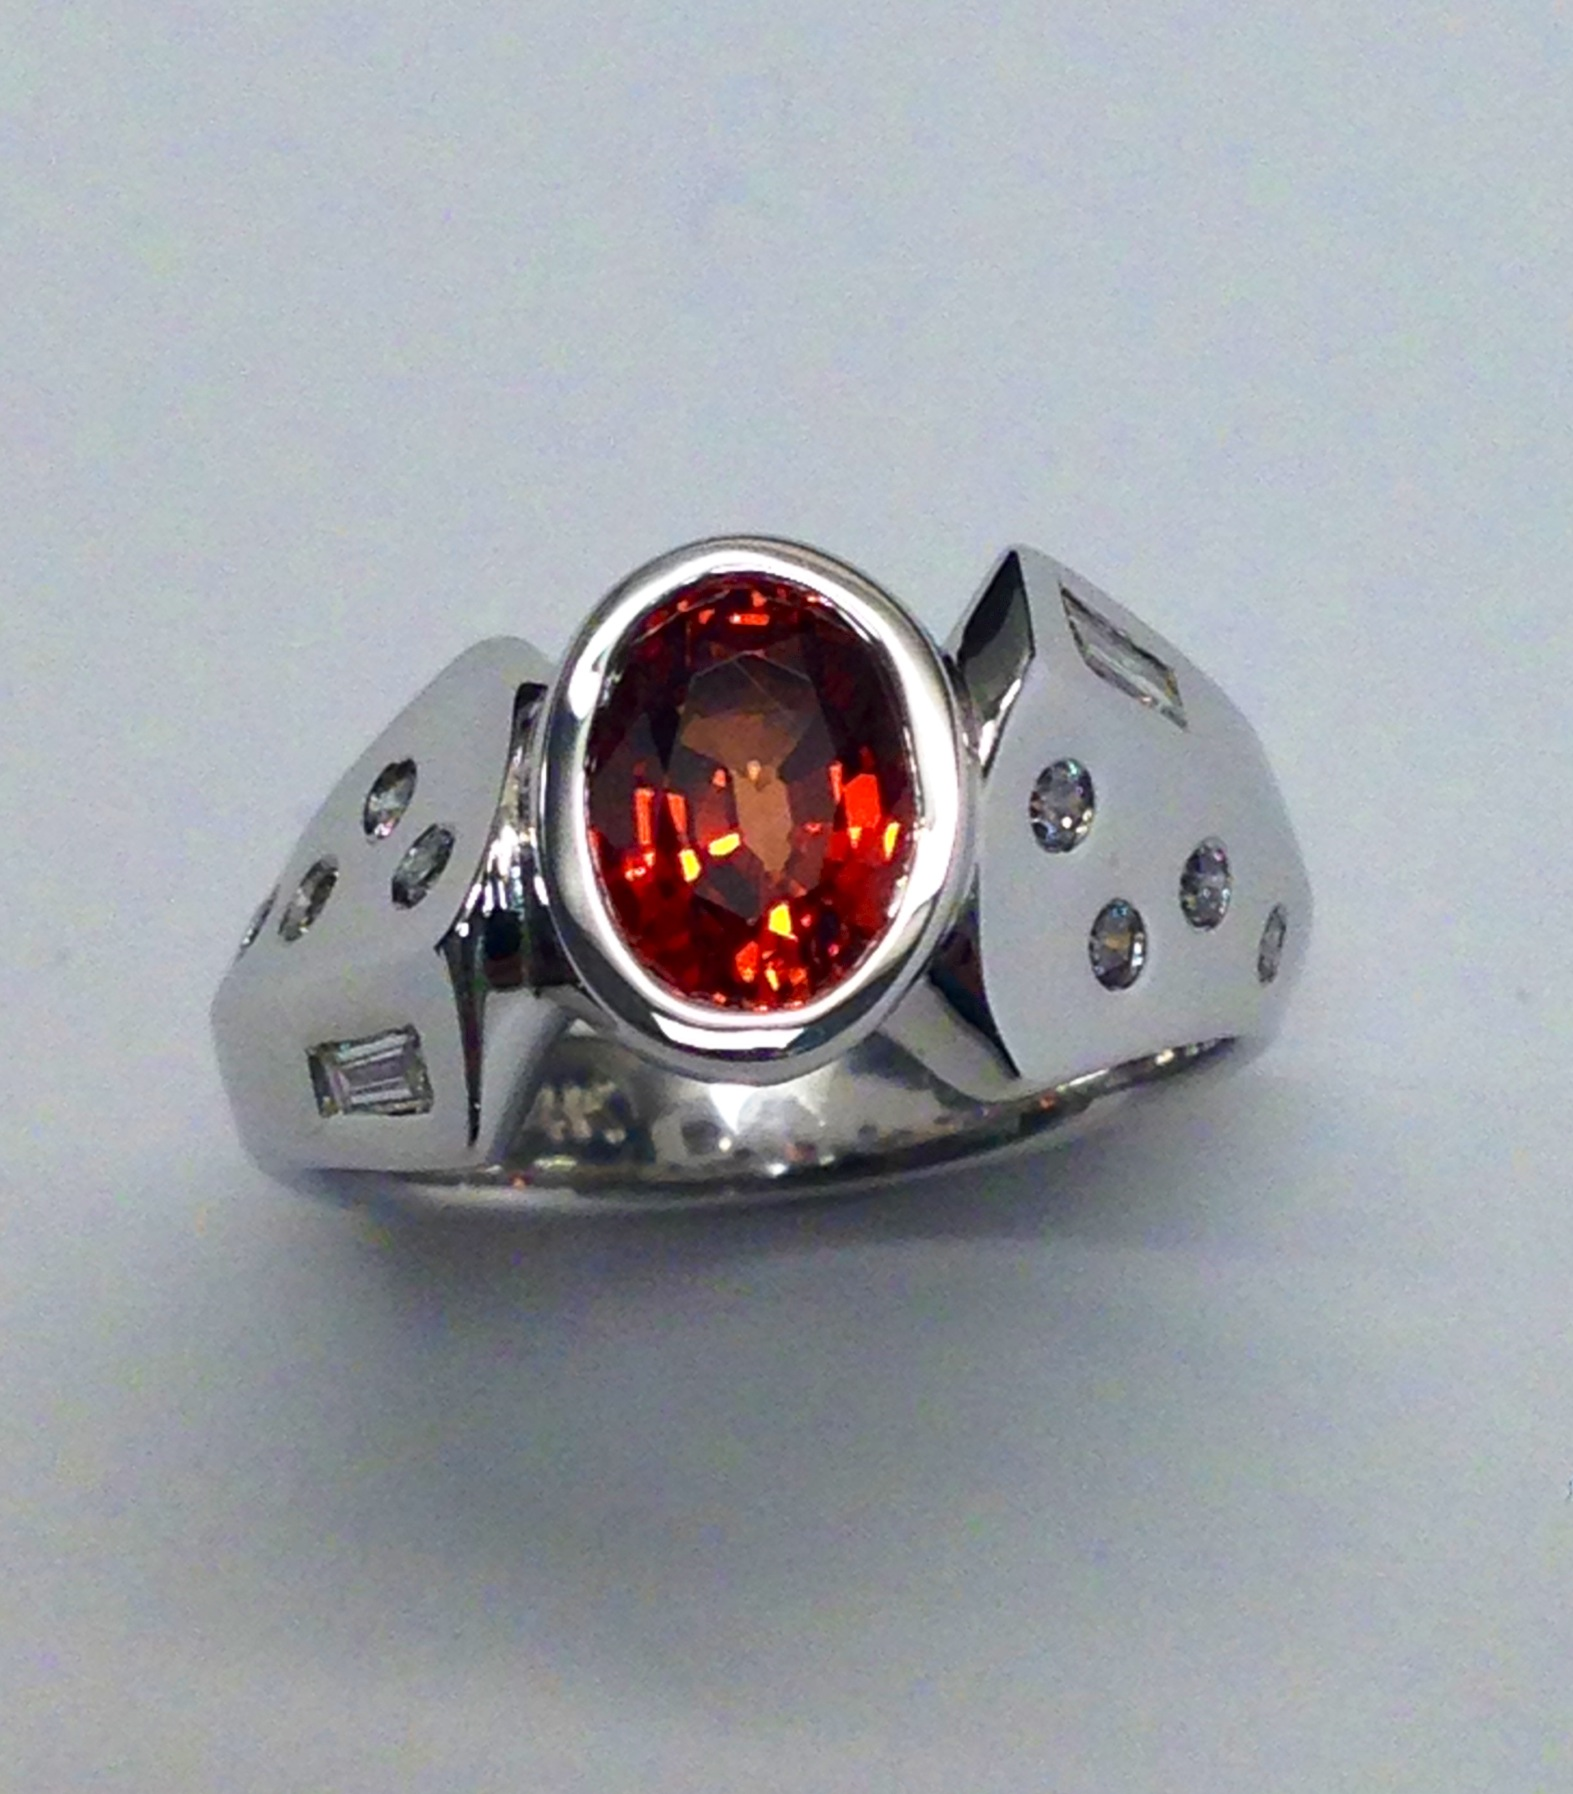 unique-oval-cut-orange-sapphire-alternative-bridal-engagement-ring-diamond-accents-white-gold-ring-craft-revival-jewelry-store-grand-rapids-michigan-west-michigan